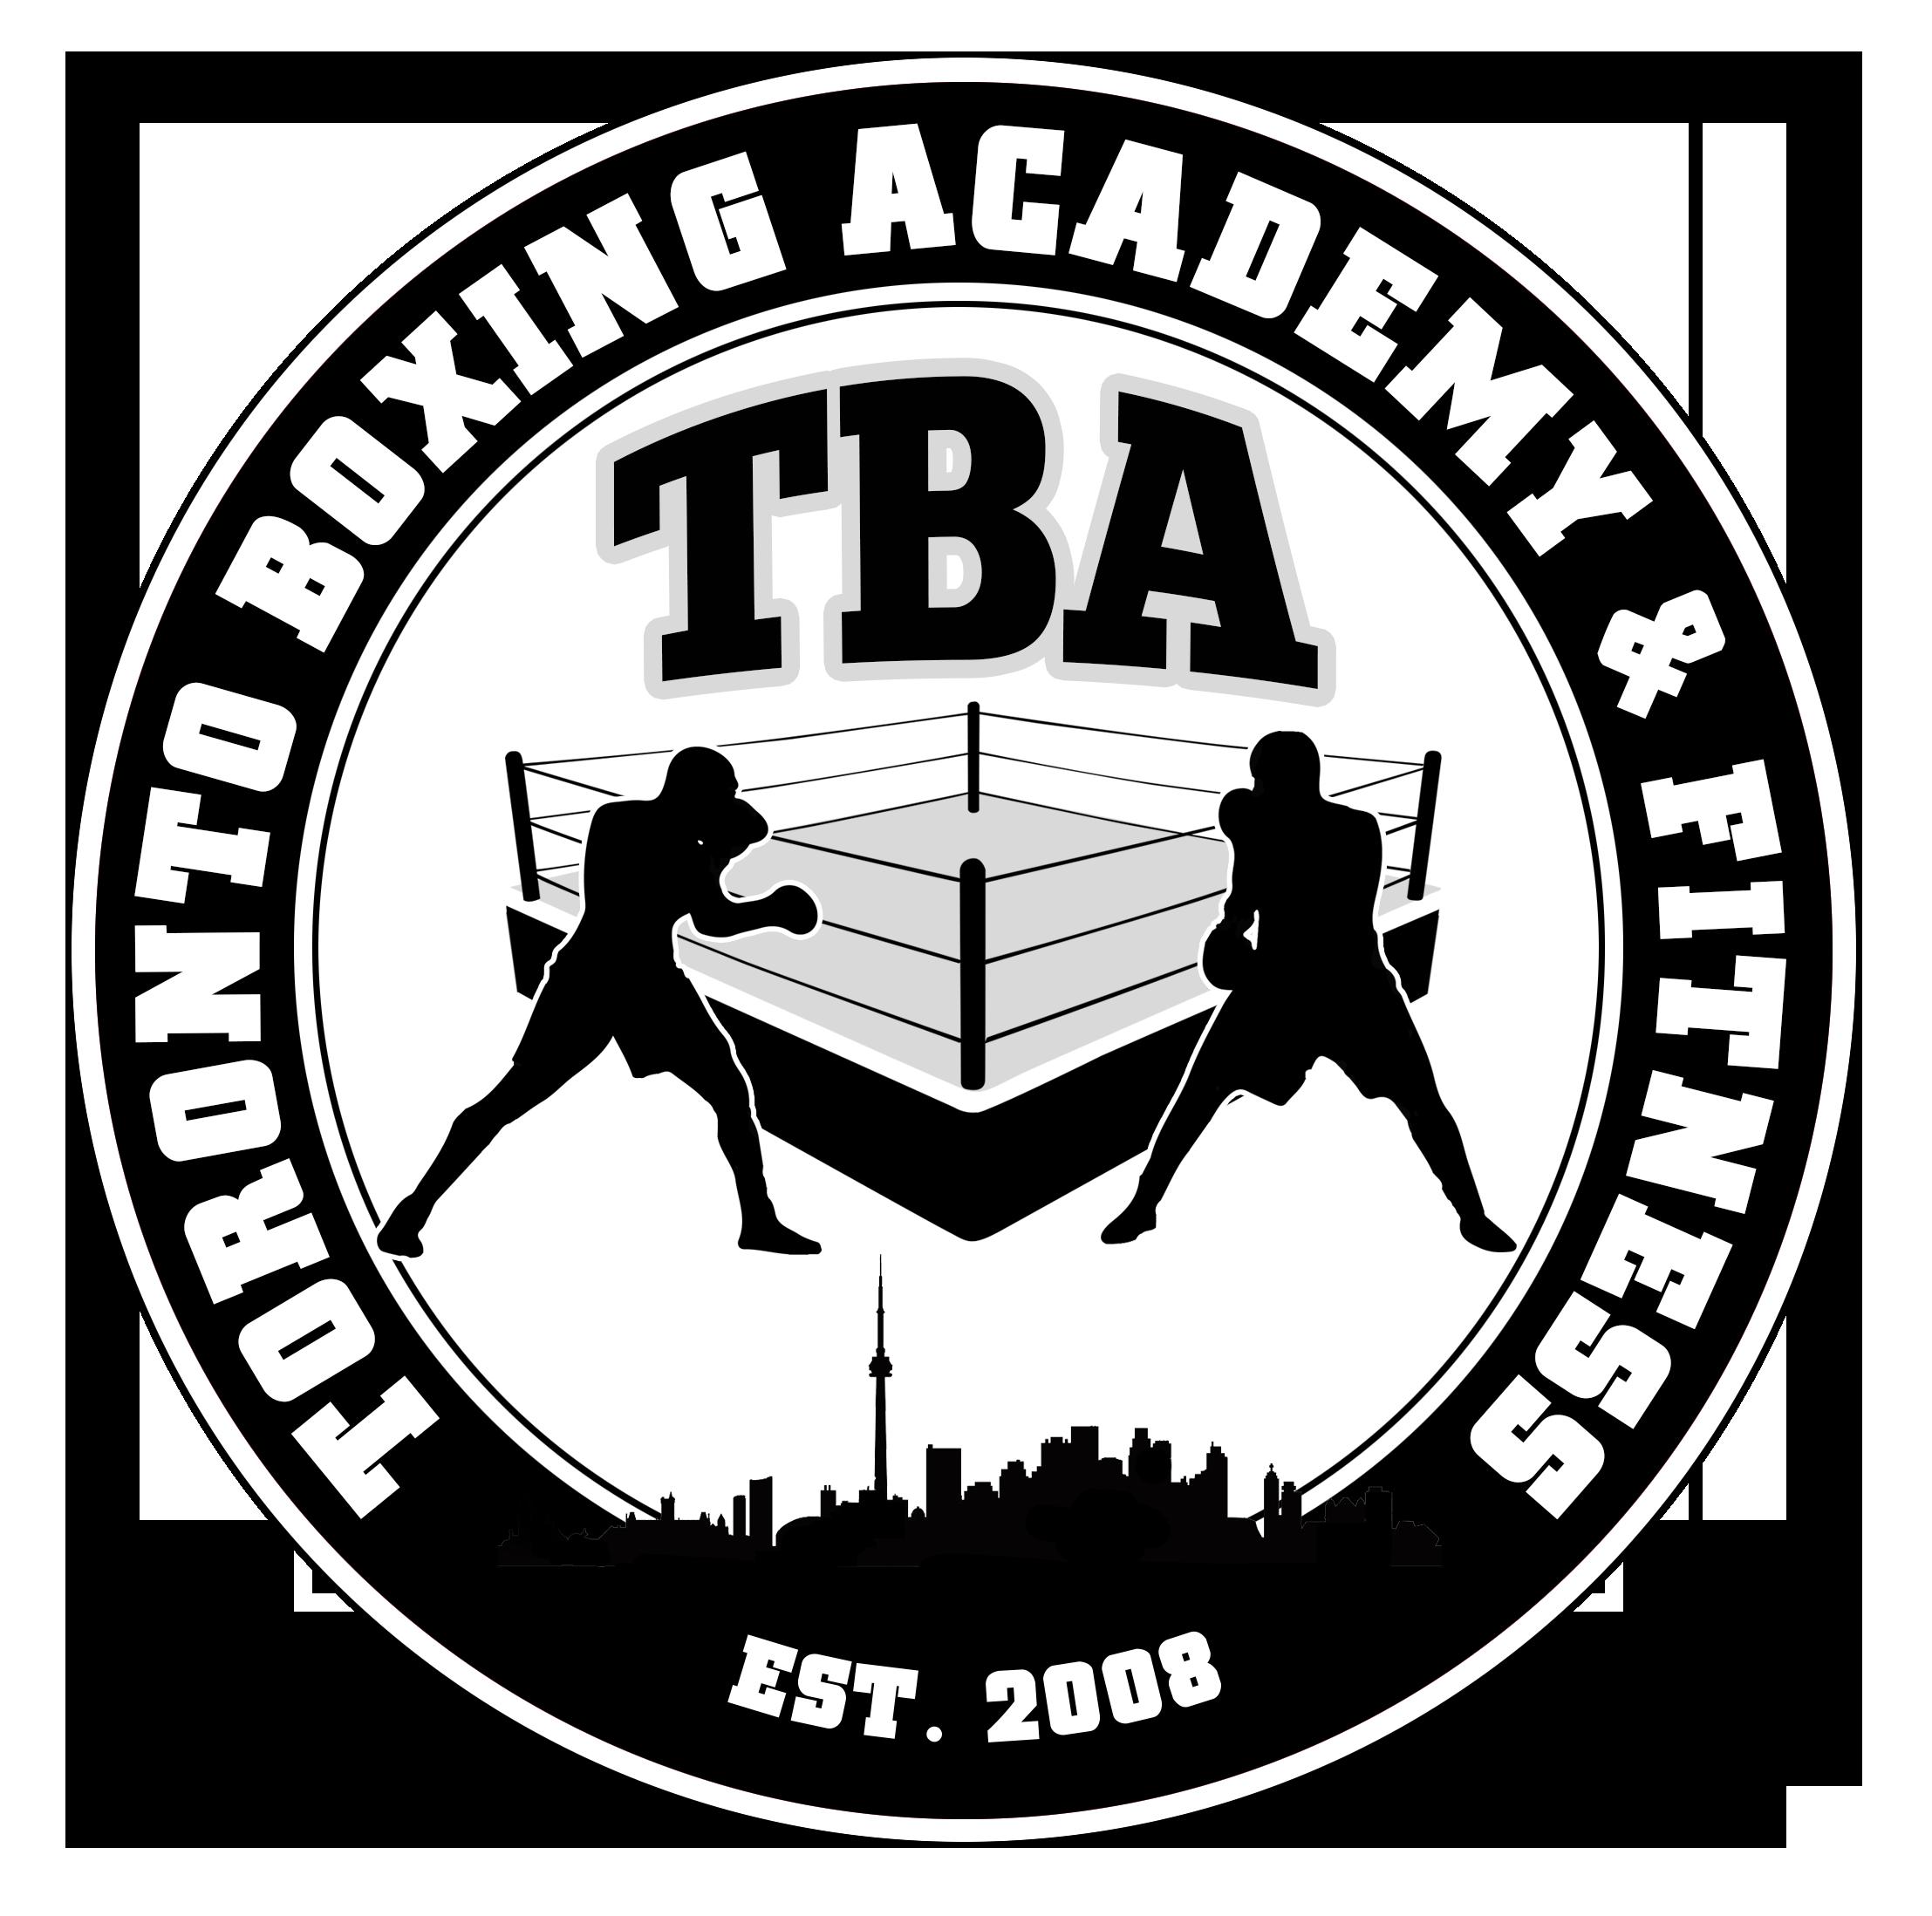 Toronto Boxing Academy